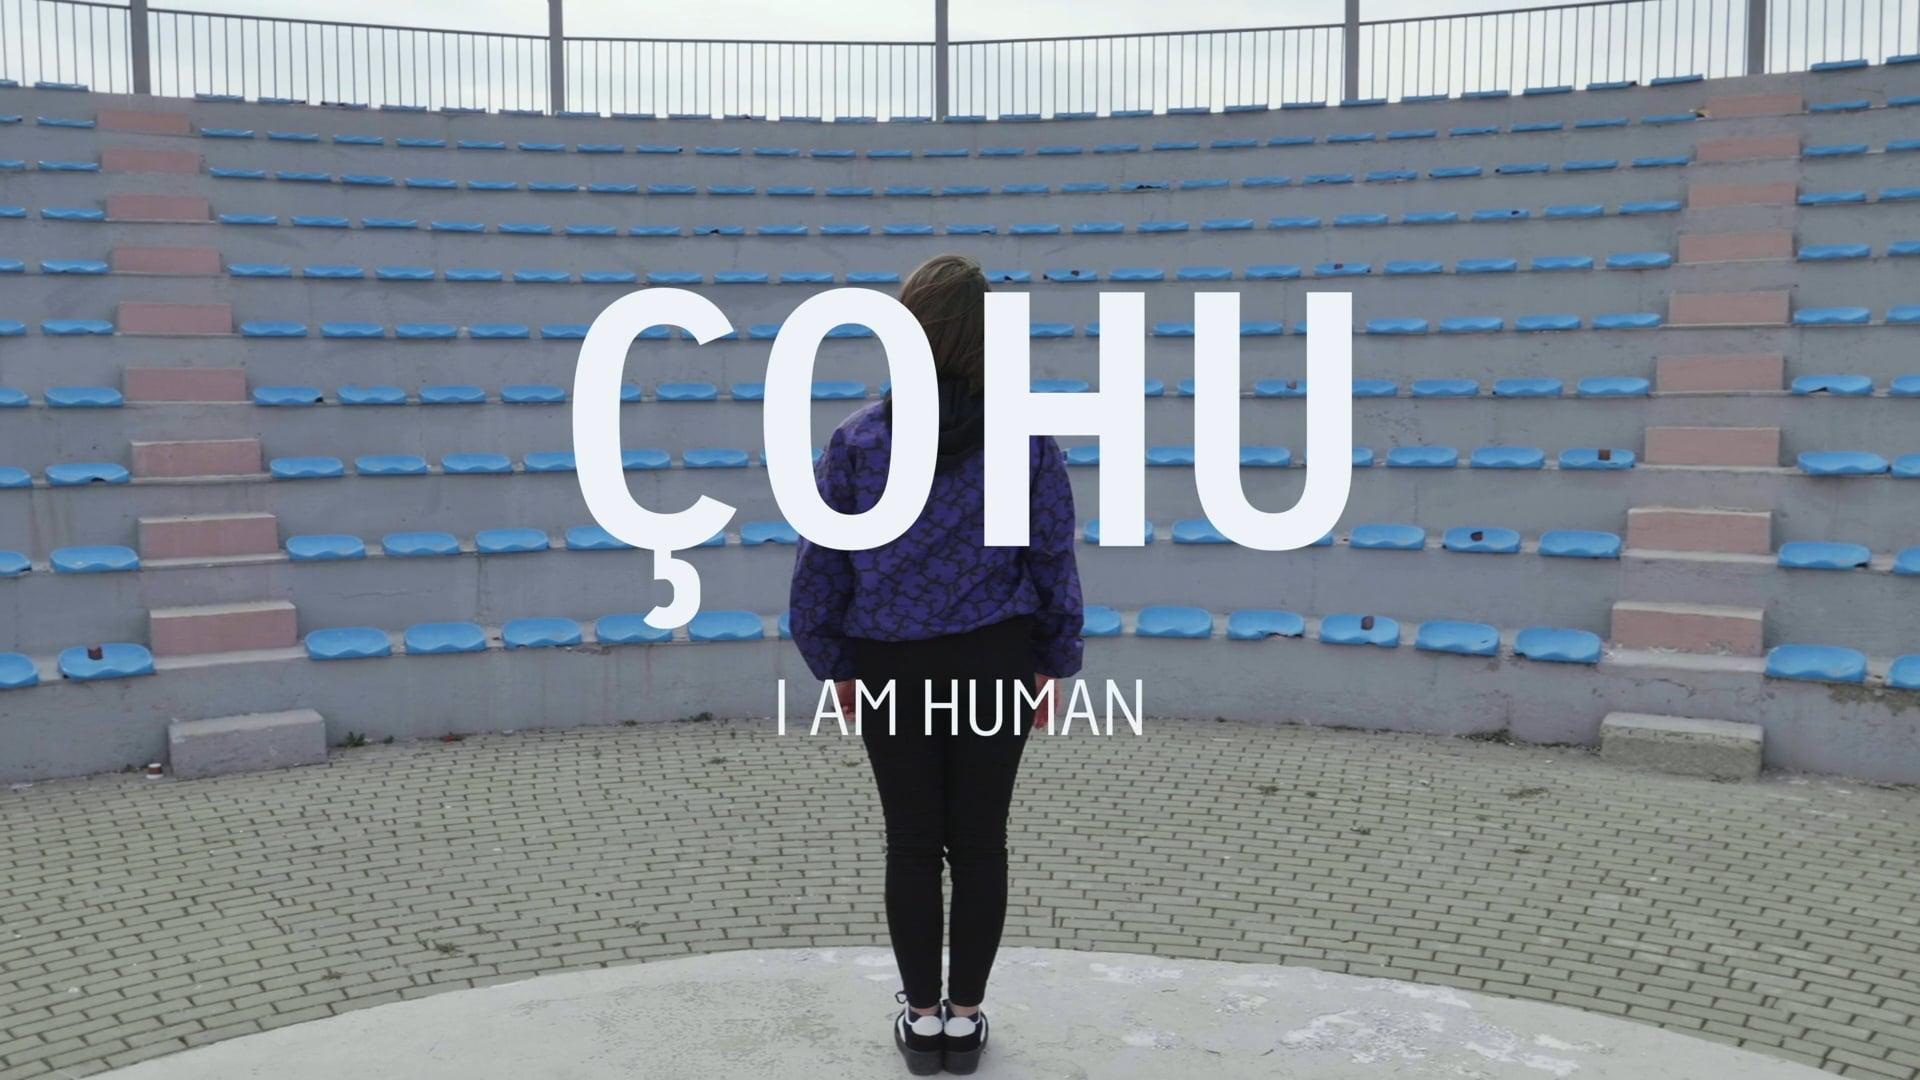 ÇOHU - I am human